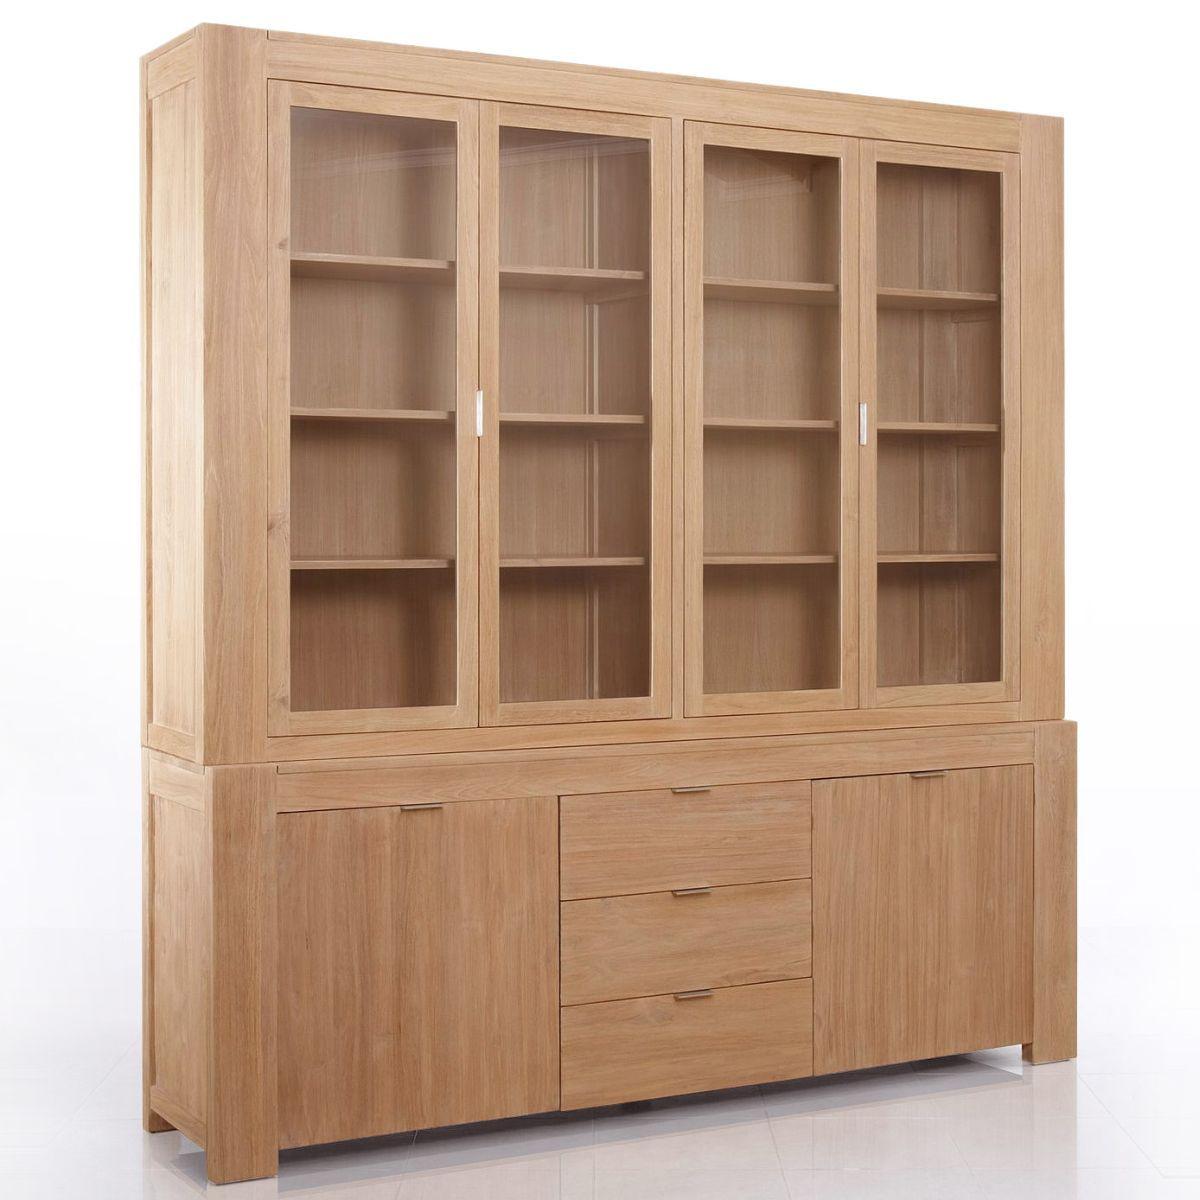 Great Teak modern display cabinet